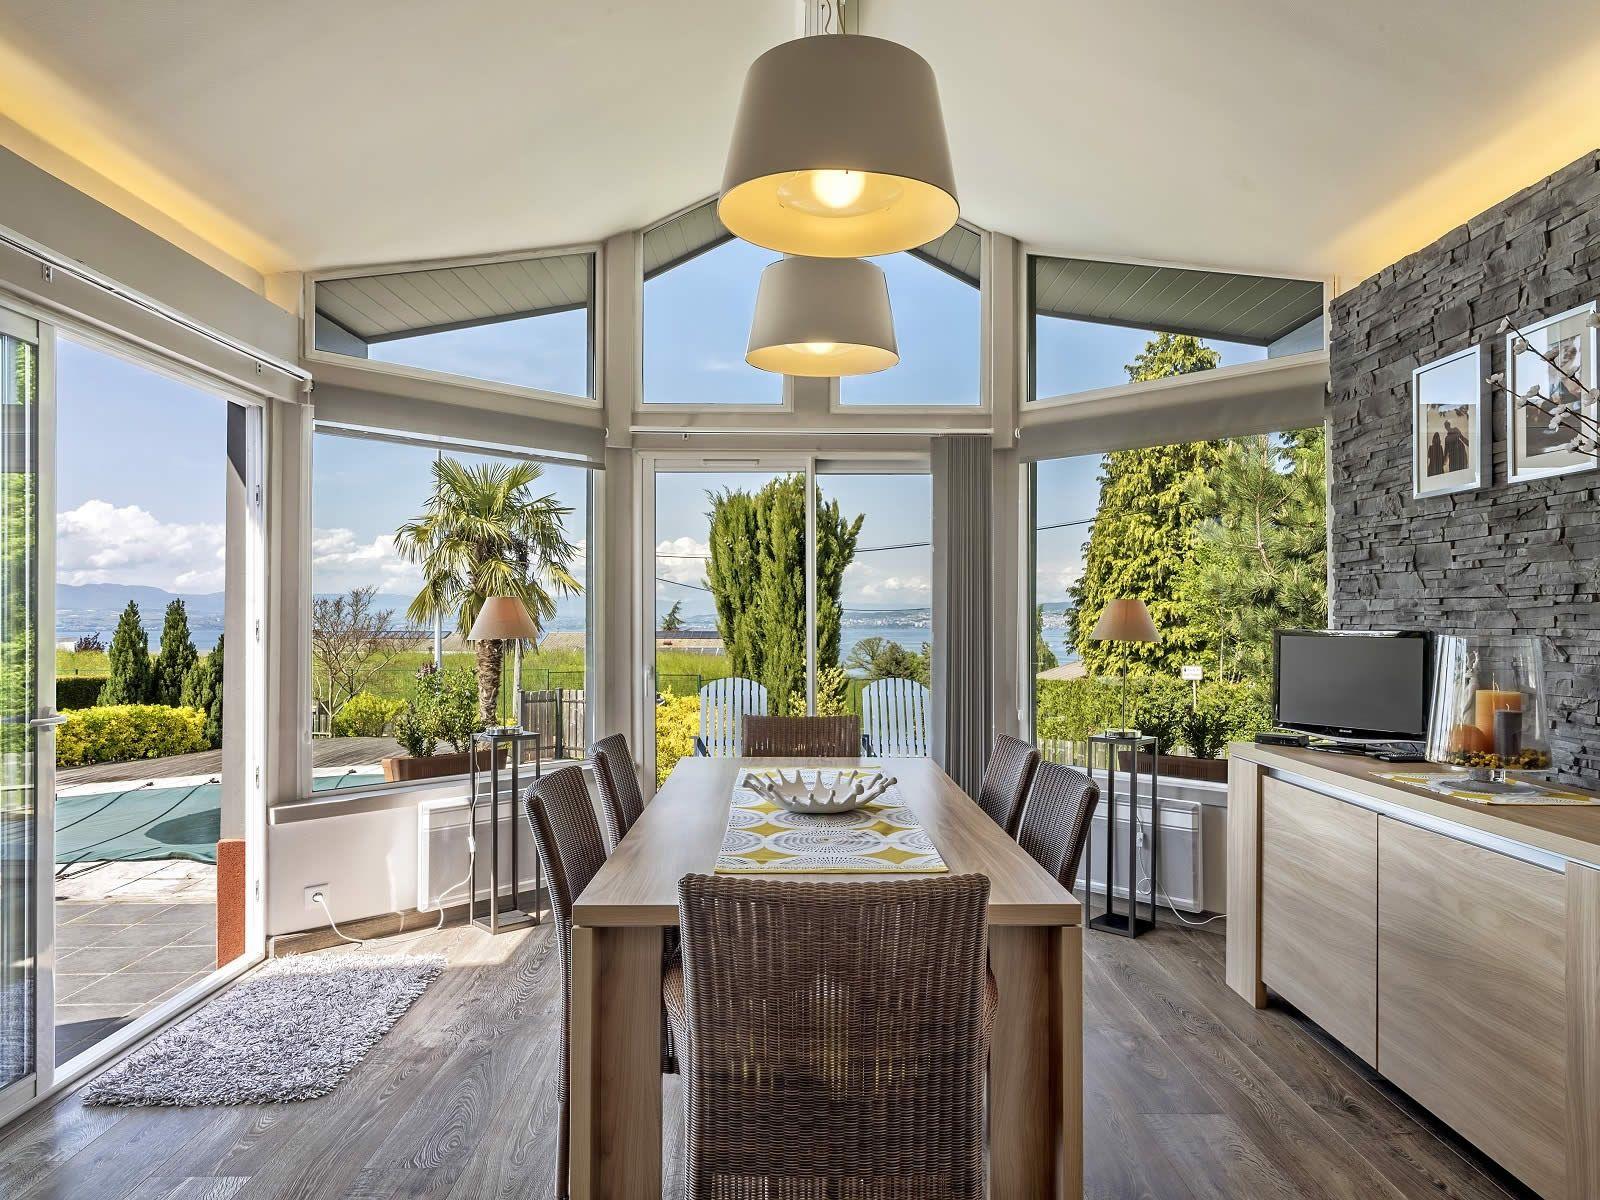 Modern House for sale in Evian Heated Veranda, Fireplace